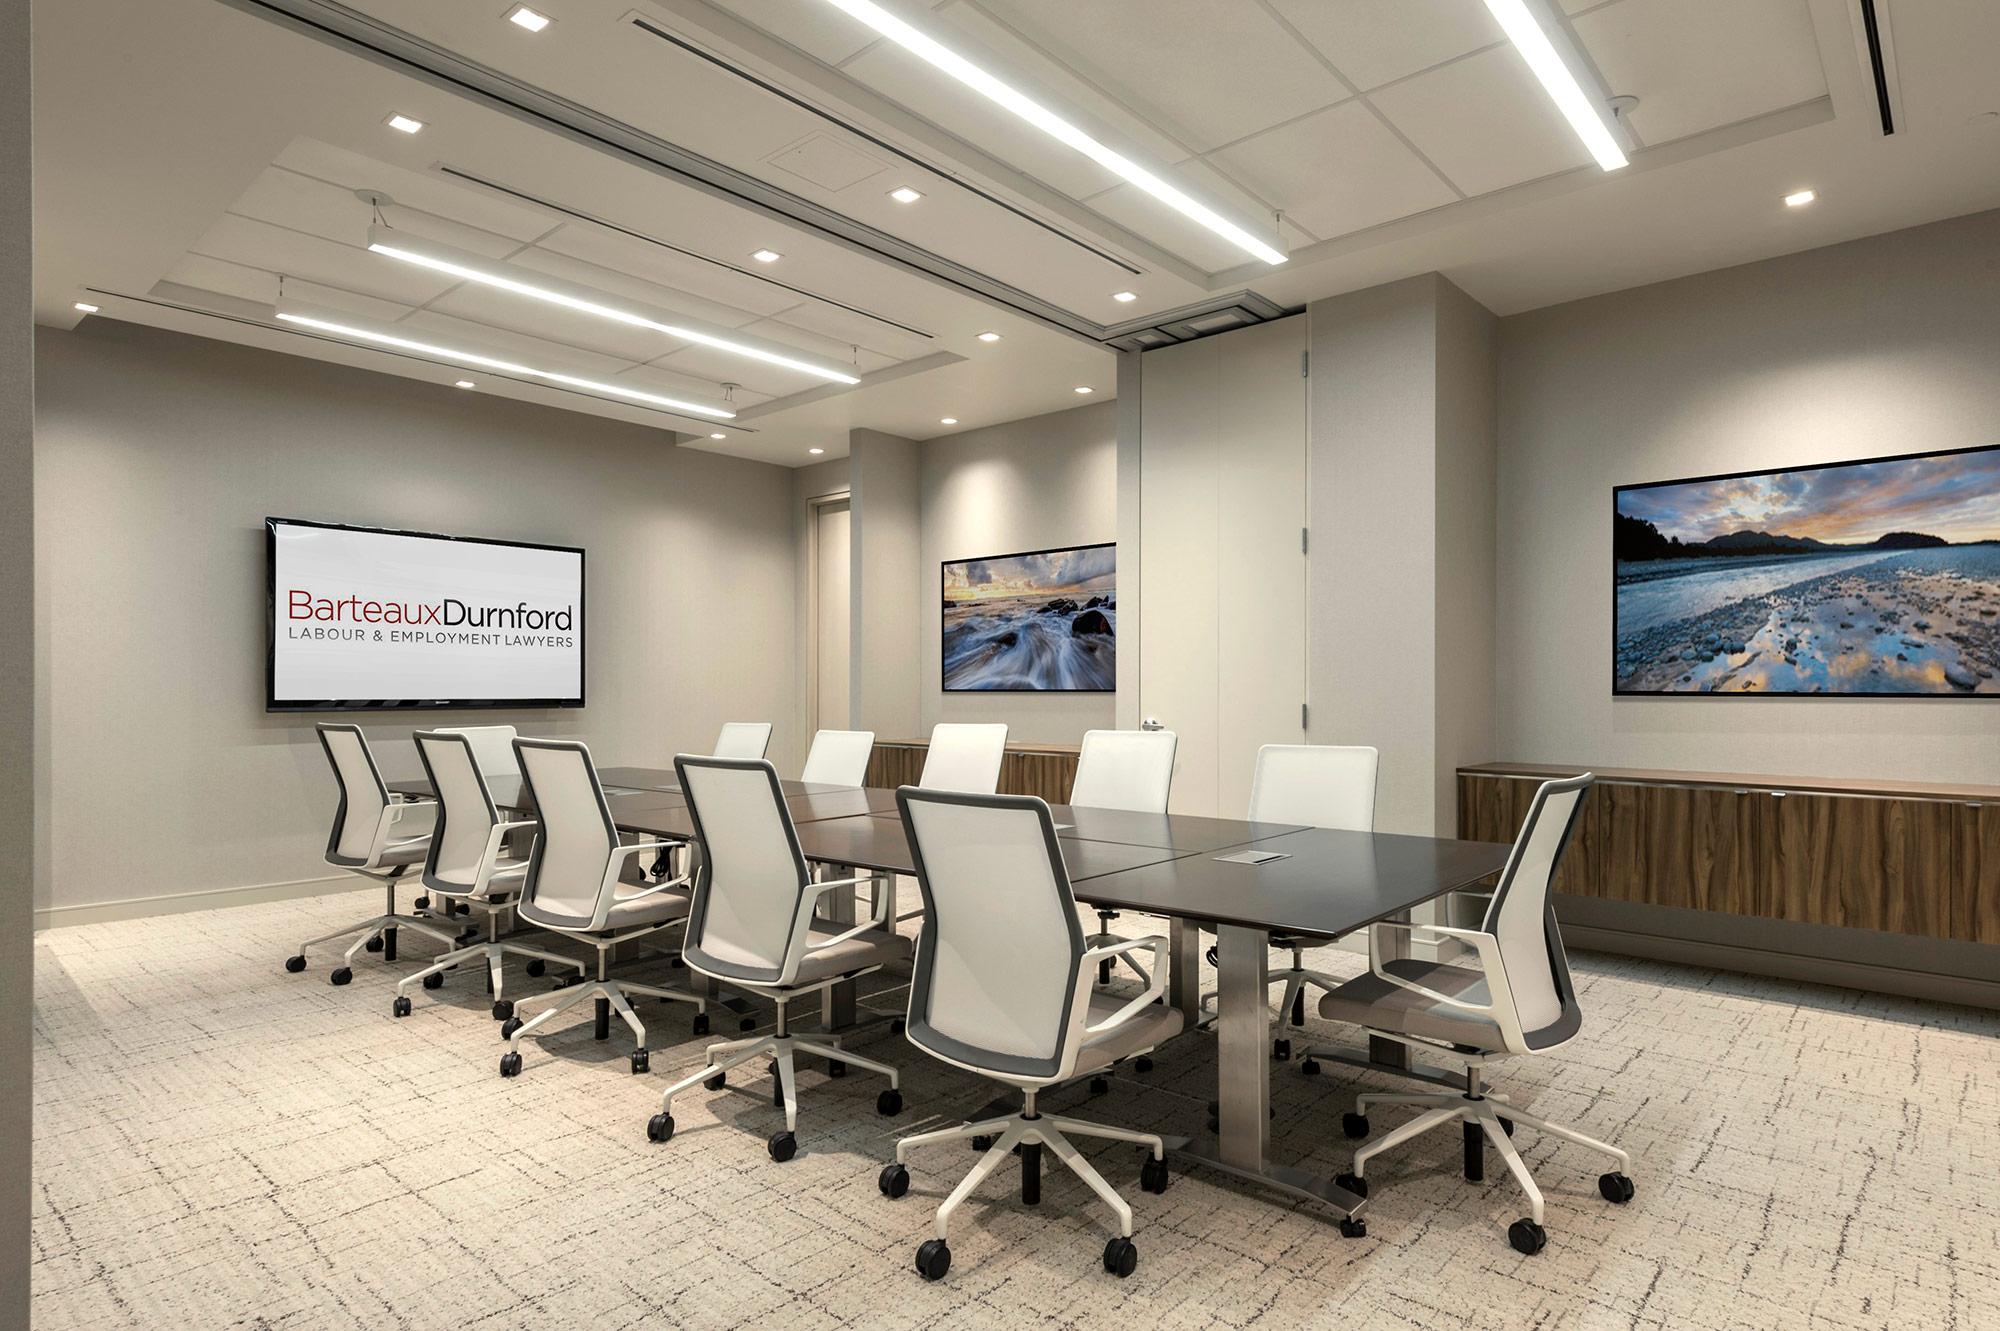 interior-design-legal-office-boardroom-chairs.jpg